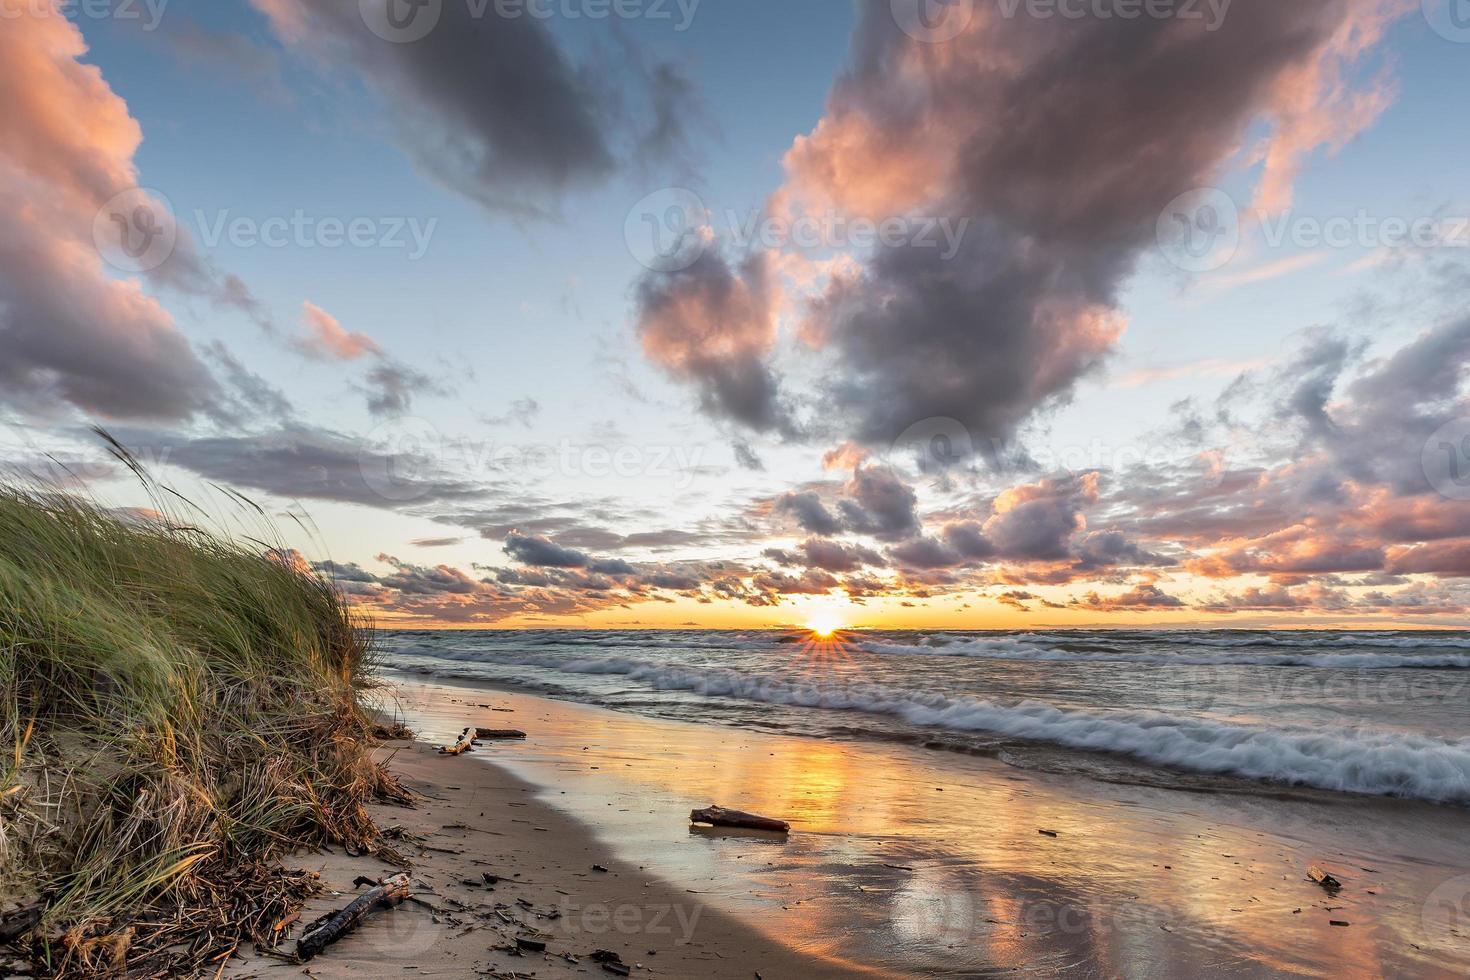 Lake Huron Beach at Sunset photo